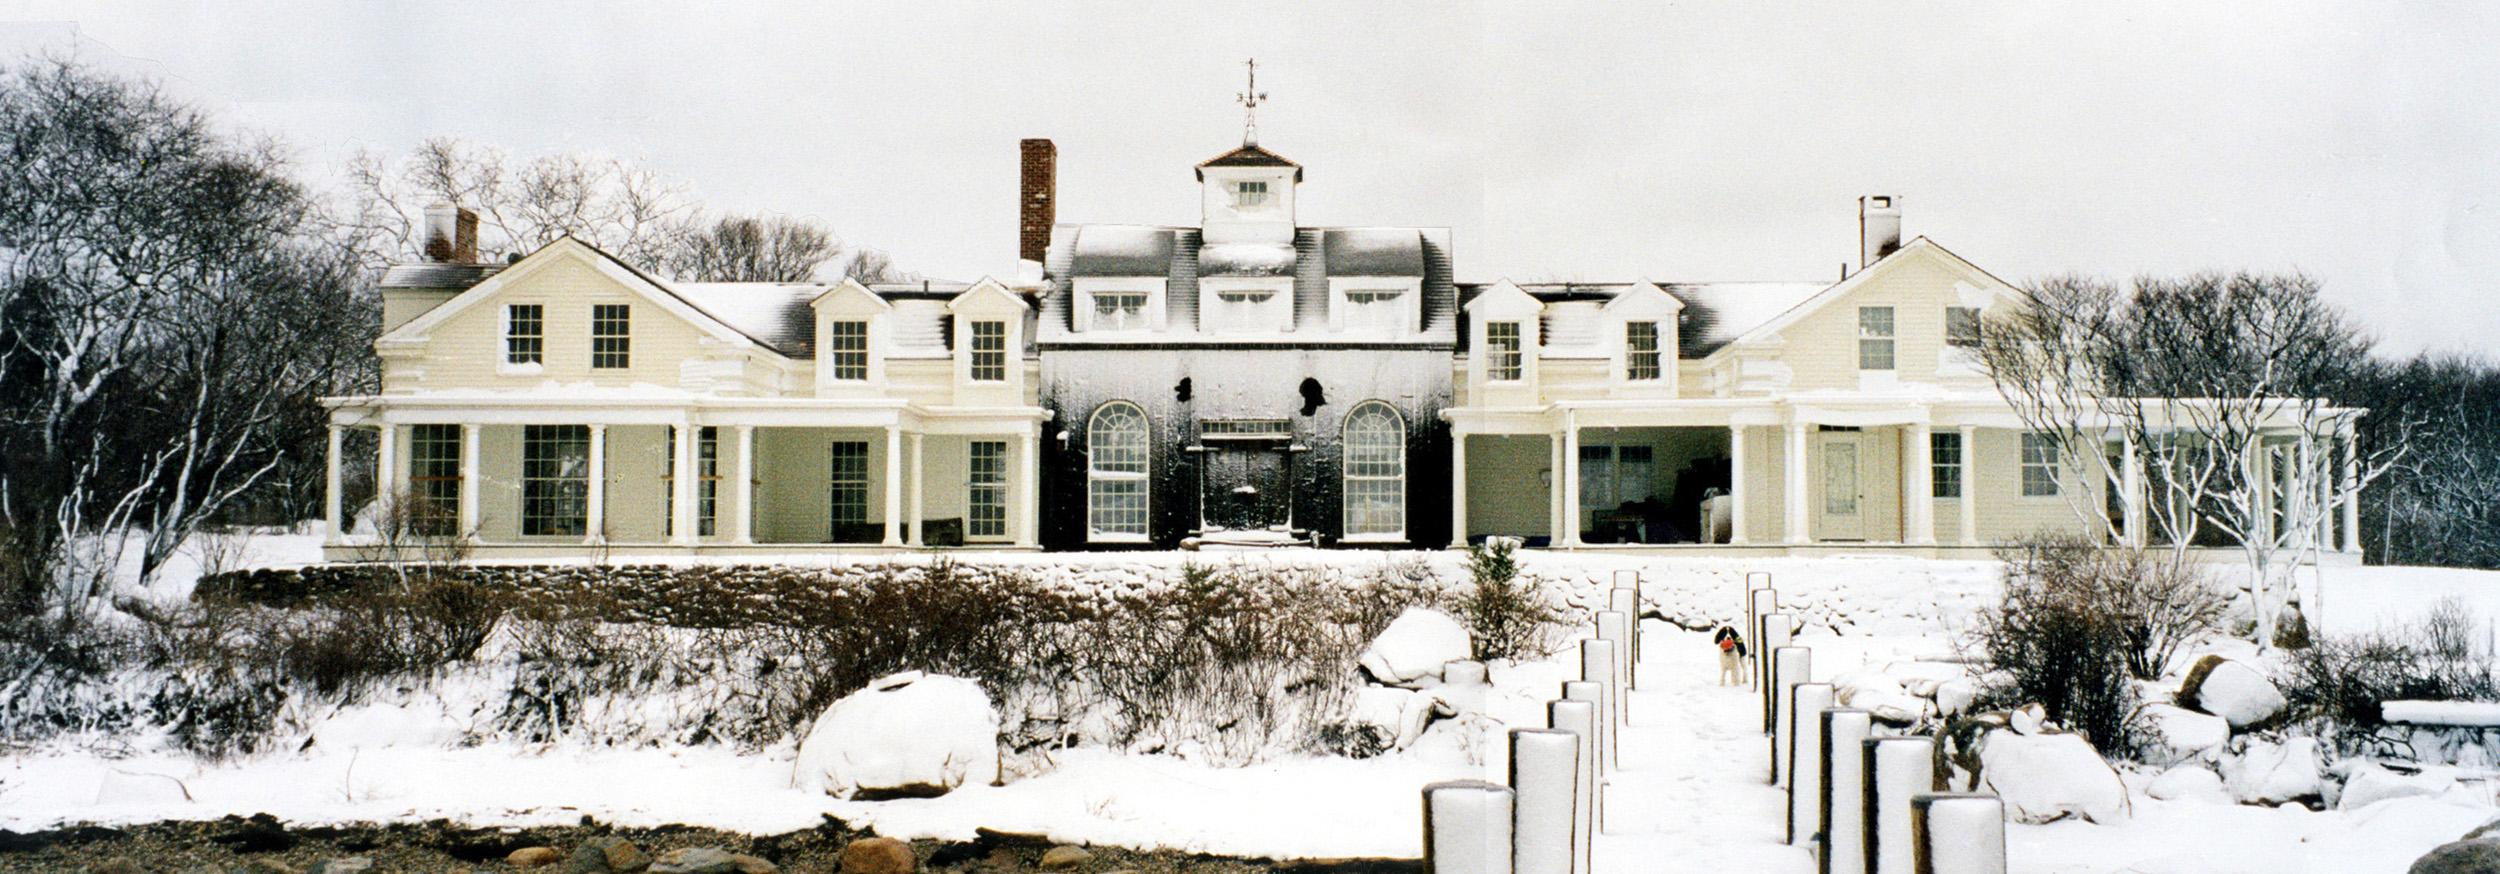 Little House - In Snow.jpg